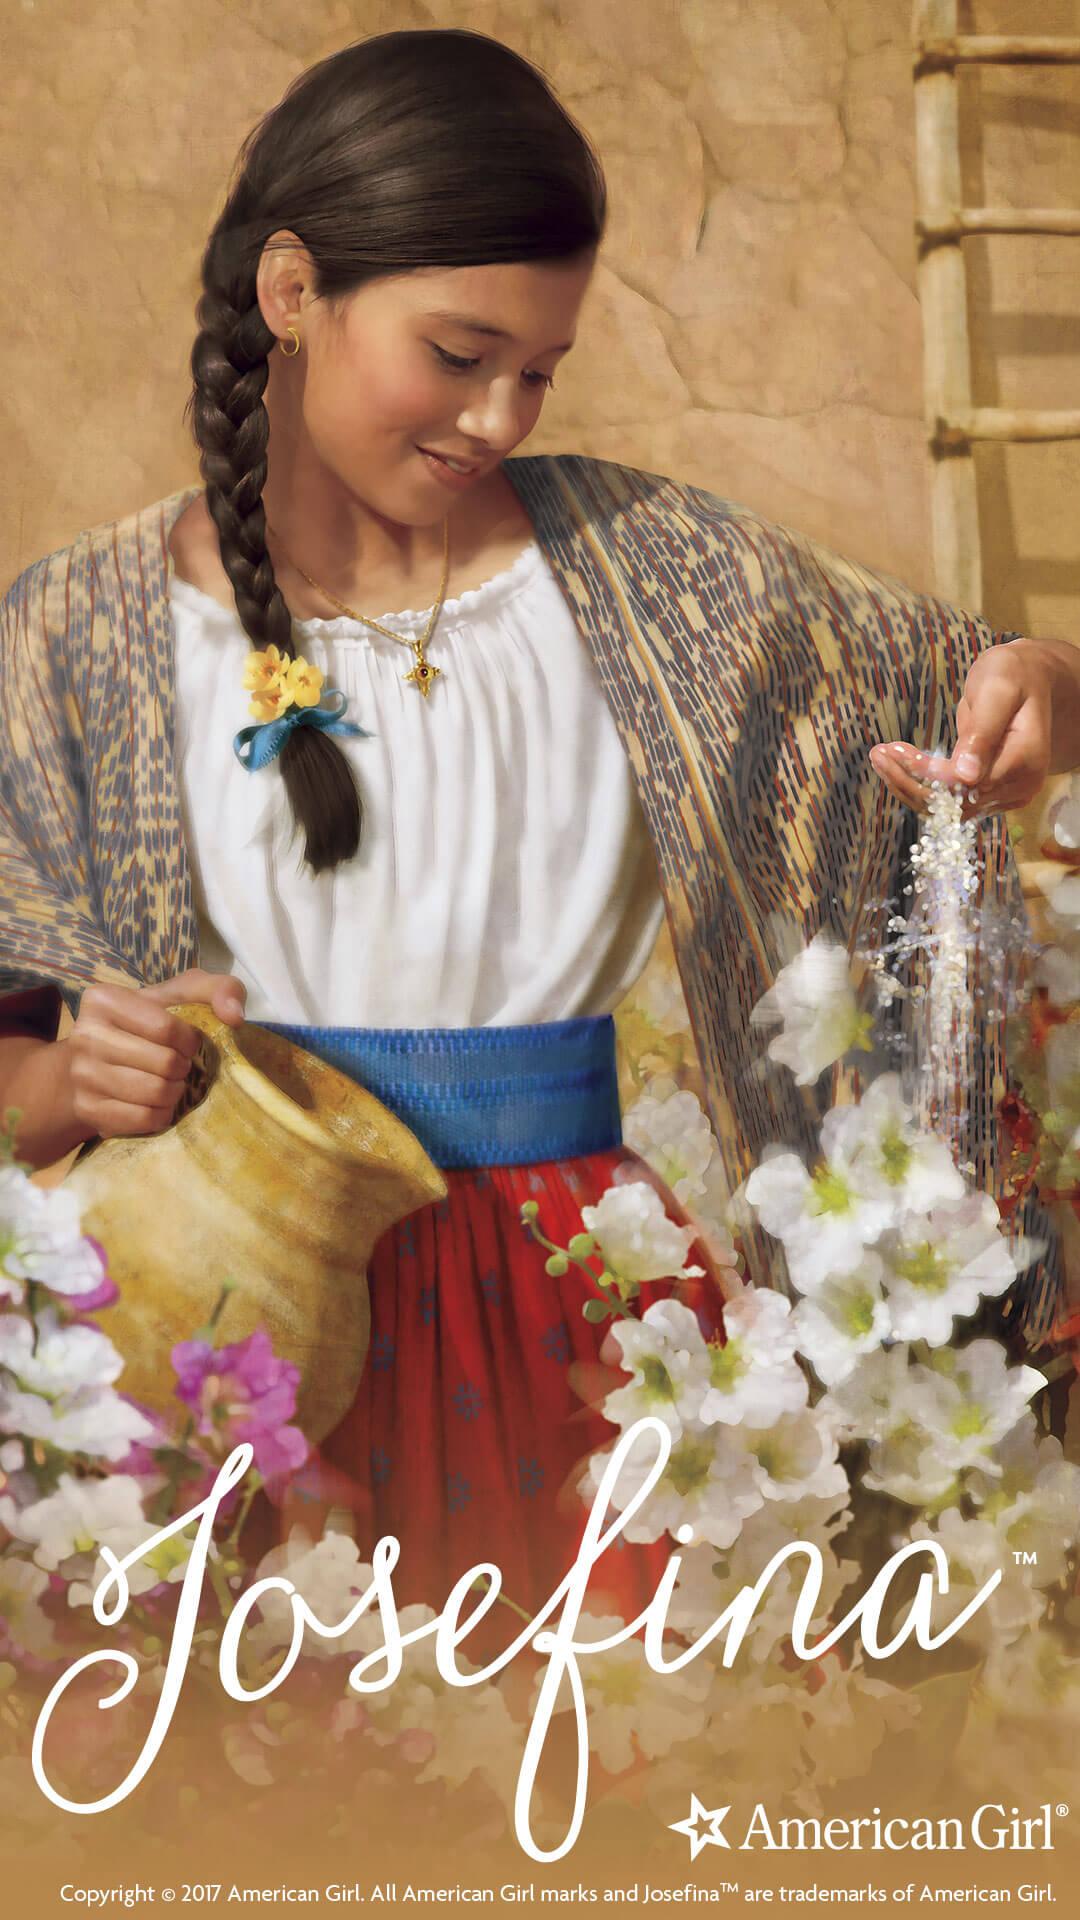 Glowing Girl Wallpaper Josefina Montoya 1824 Beforever Play At American Girl